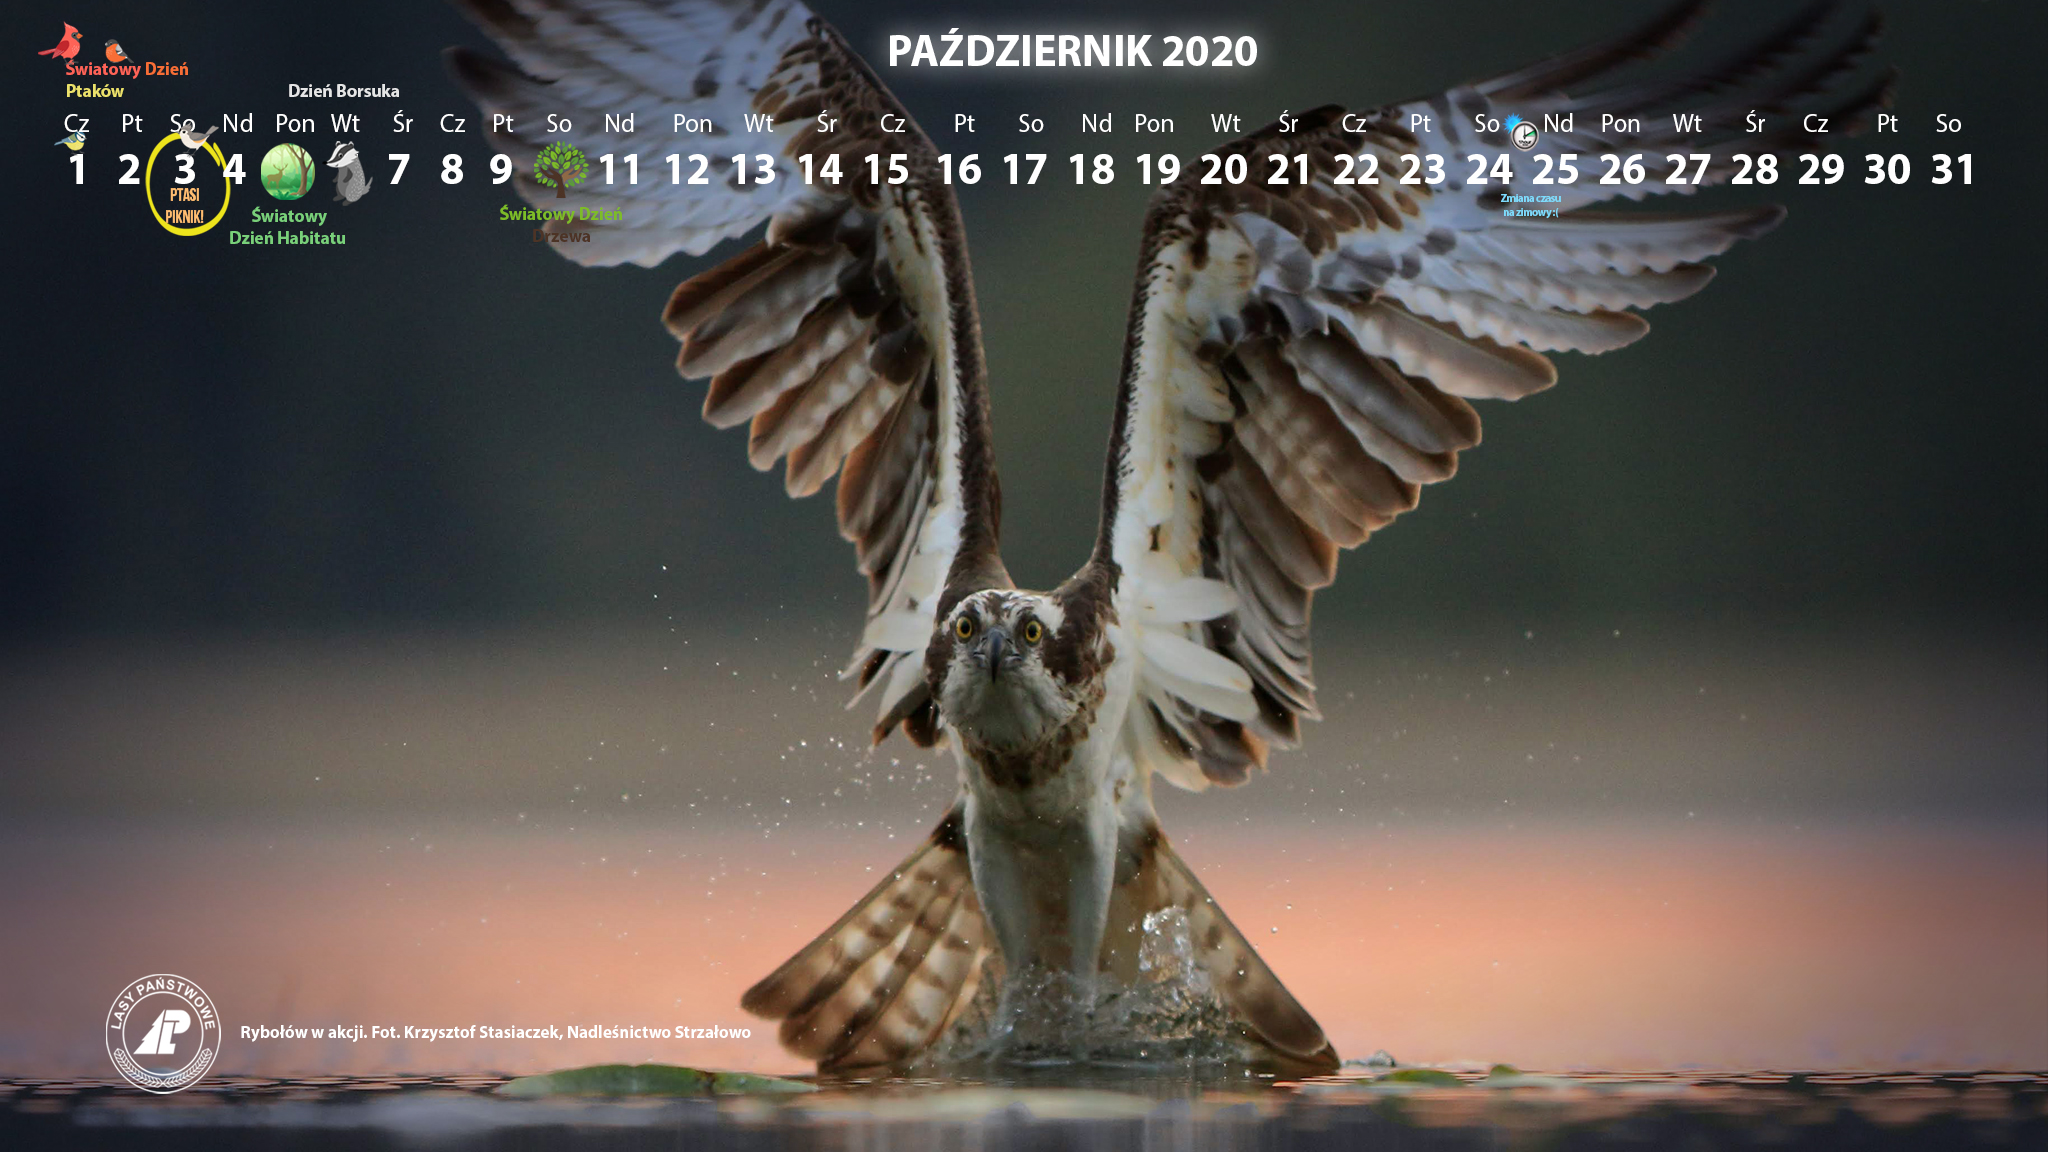 Kalendarz_2048X1152_PAŹDZIERNIK_2020[1].jpg